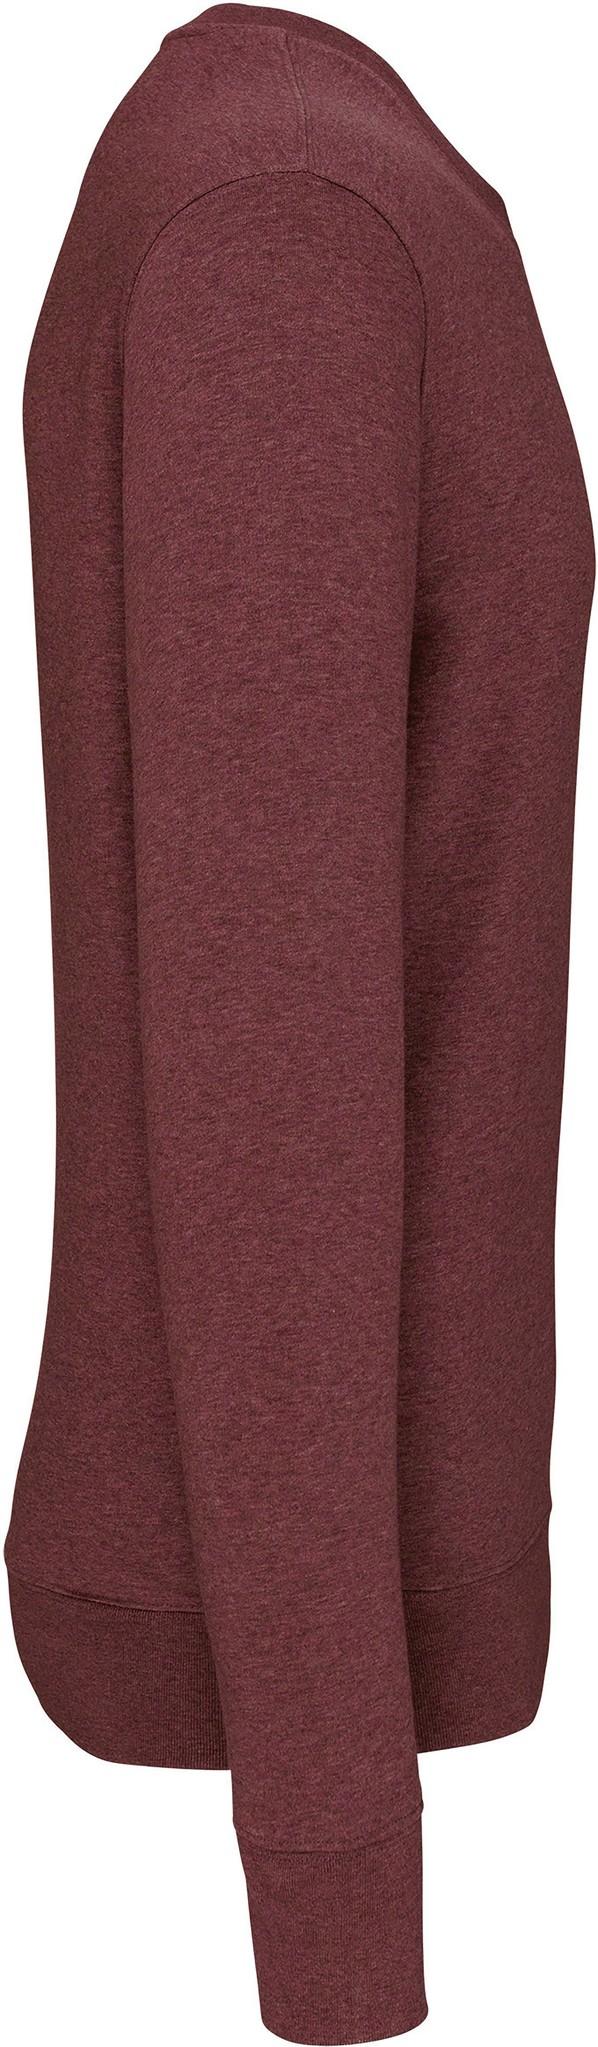 Eco-Friendly Sweater Wine gemêleerd